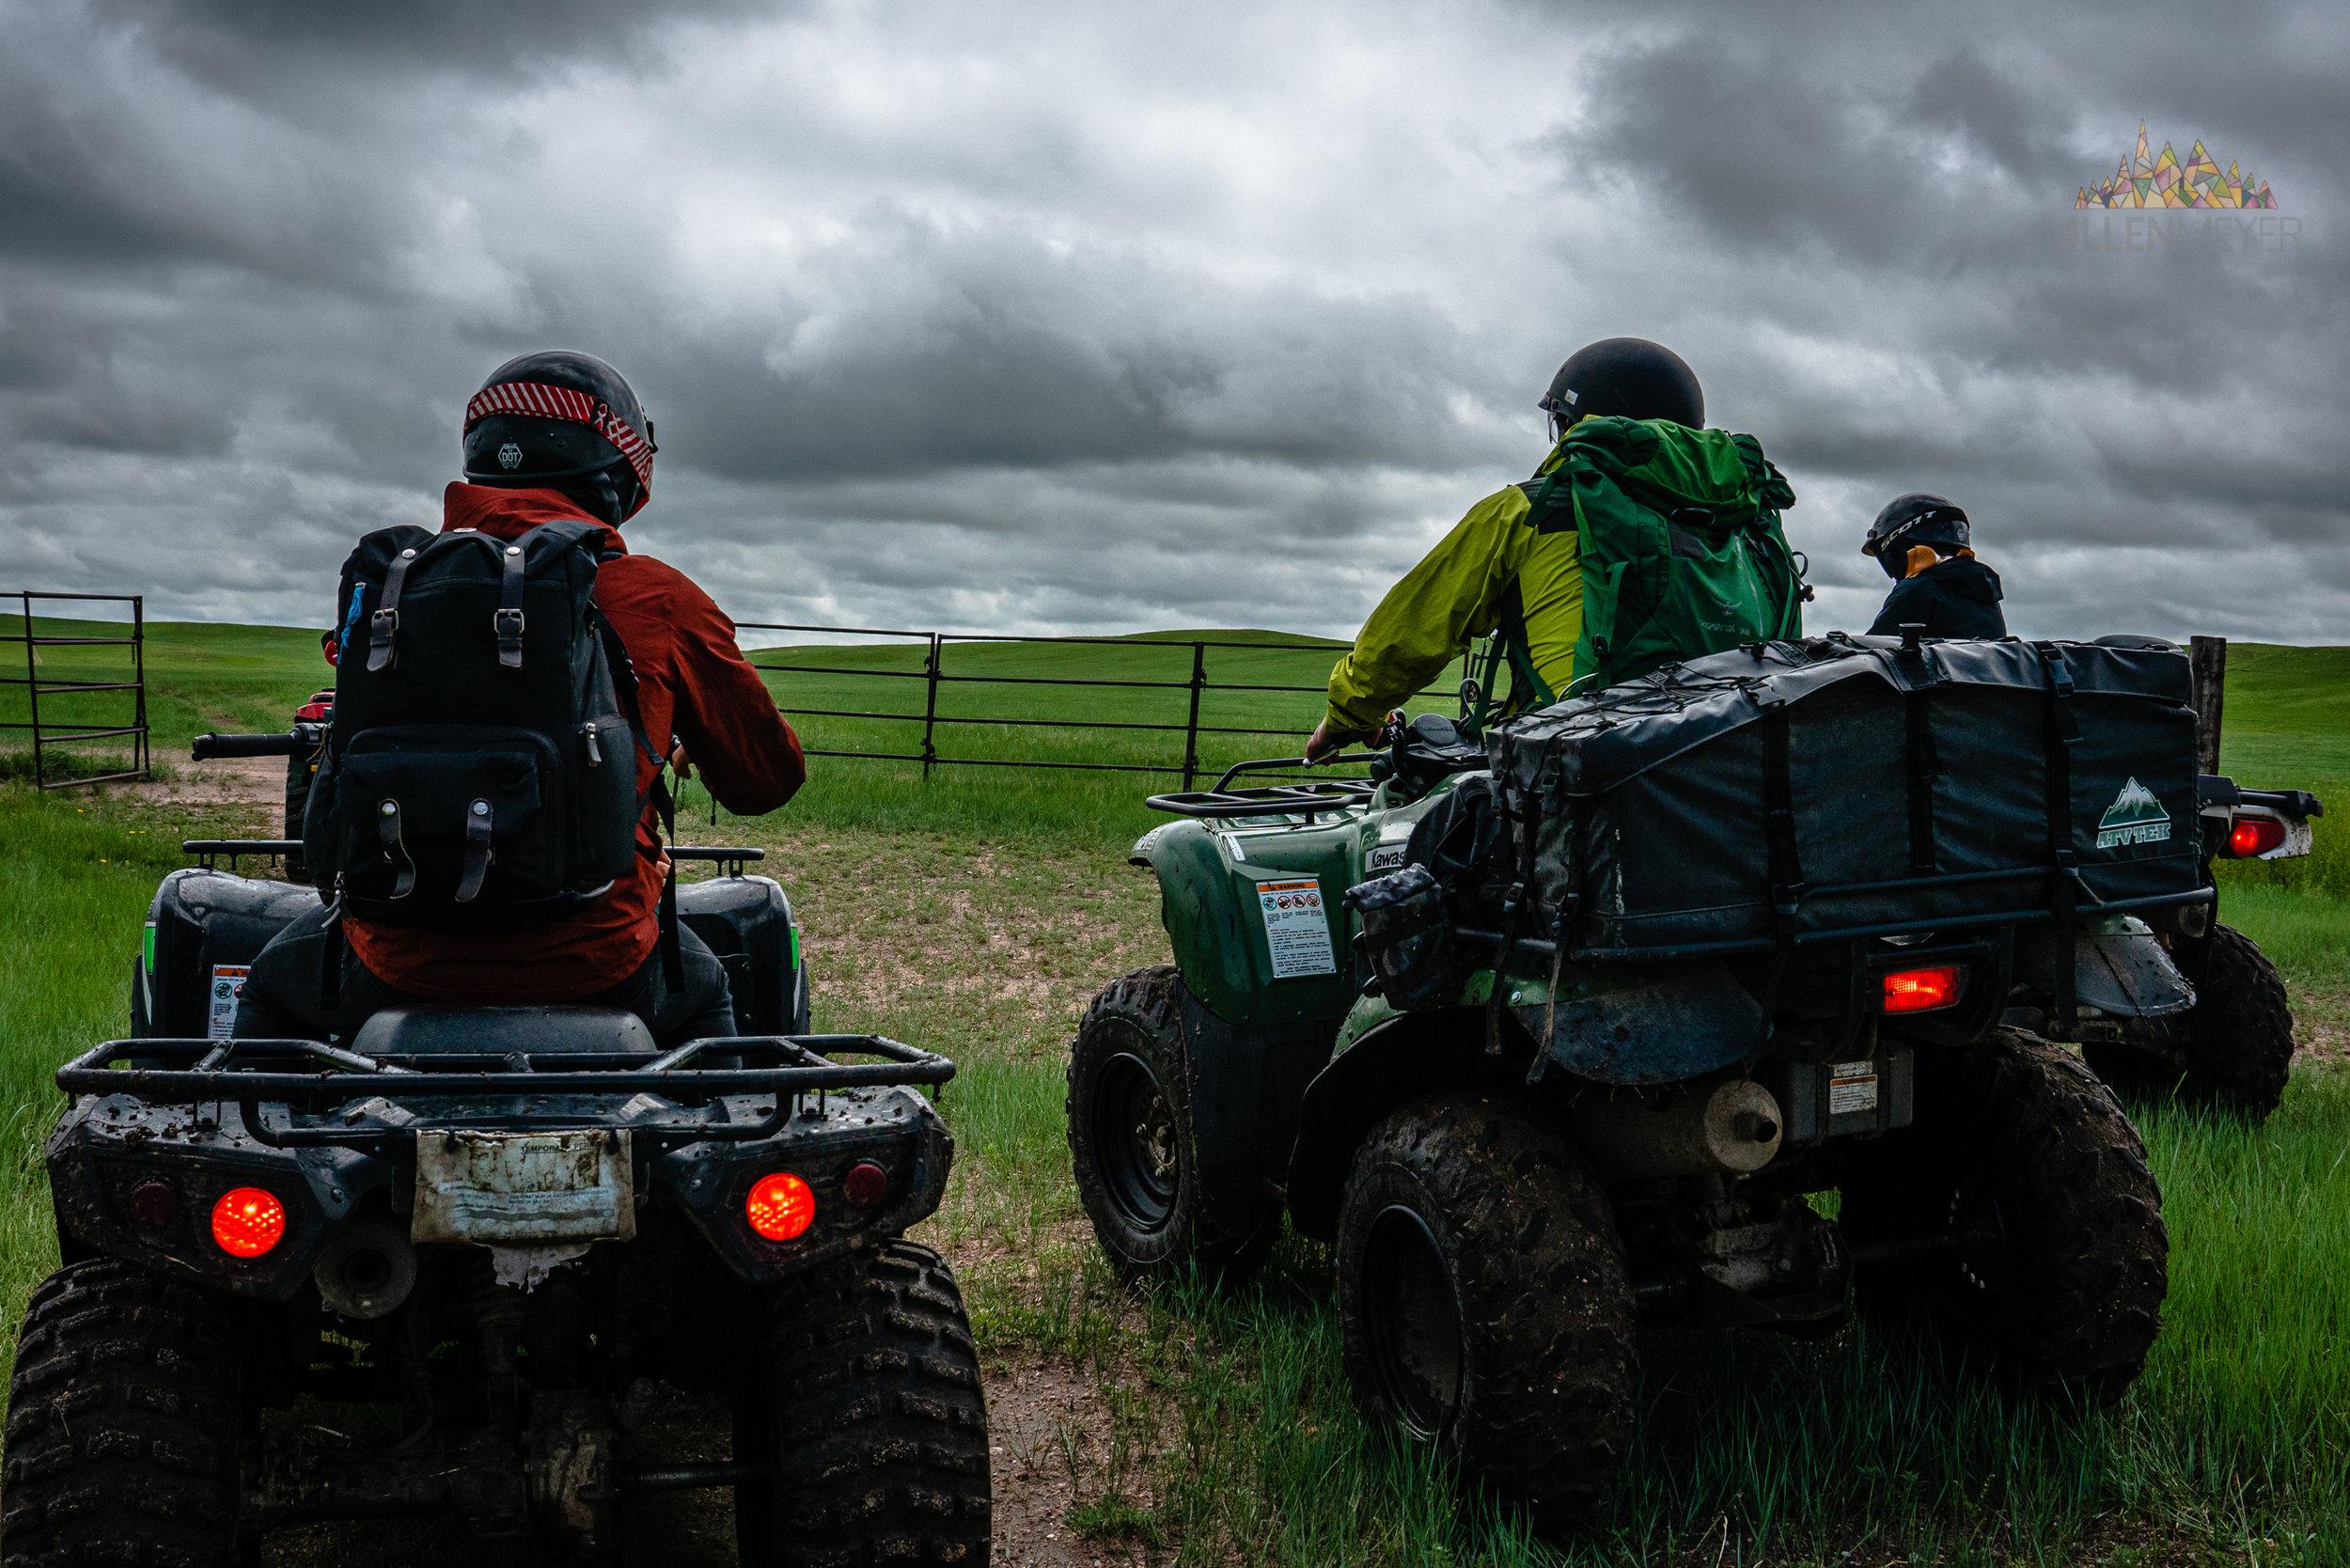 Outdoor Adventures In Cheyenne, Wyoming; Photography by Allen Meyer-03575.jpg